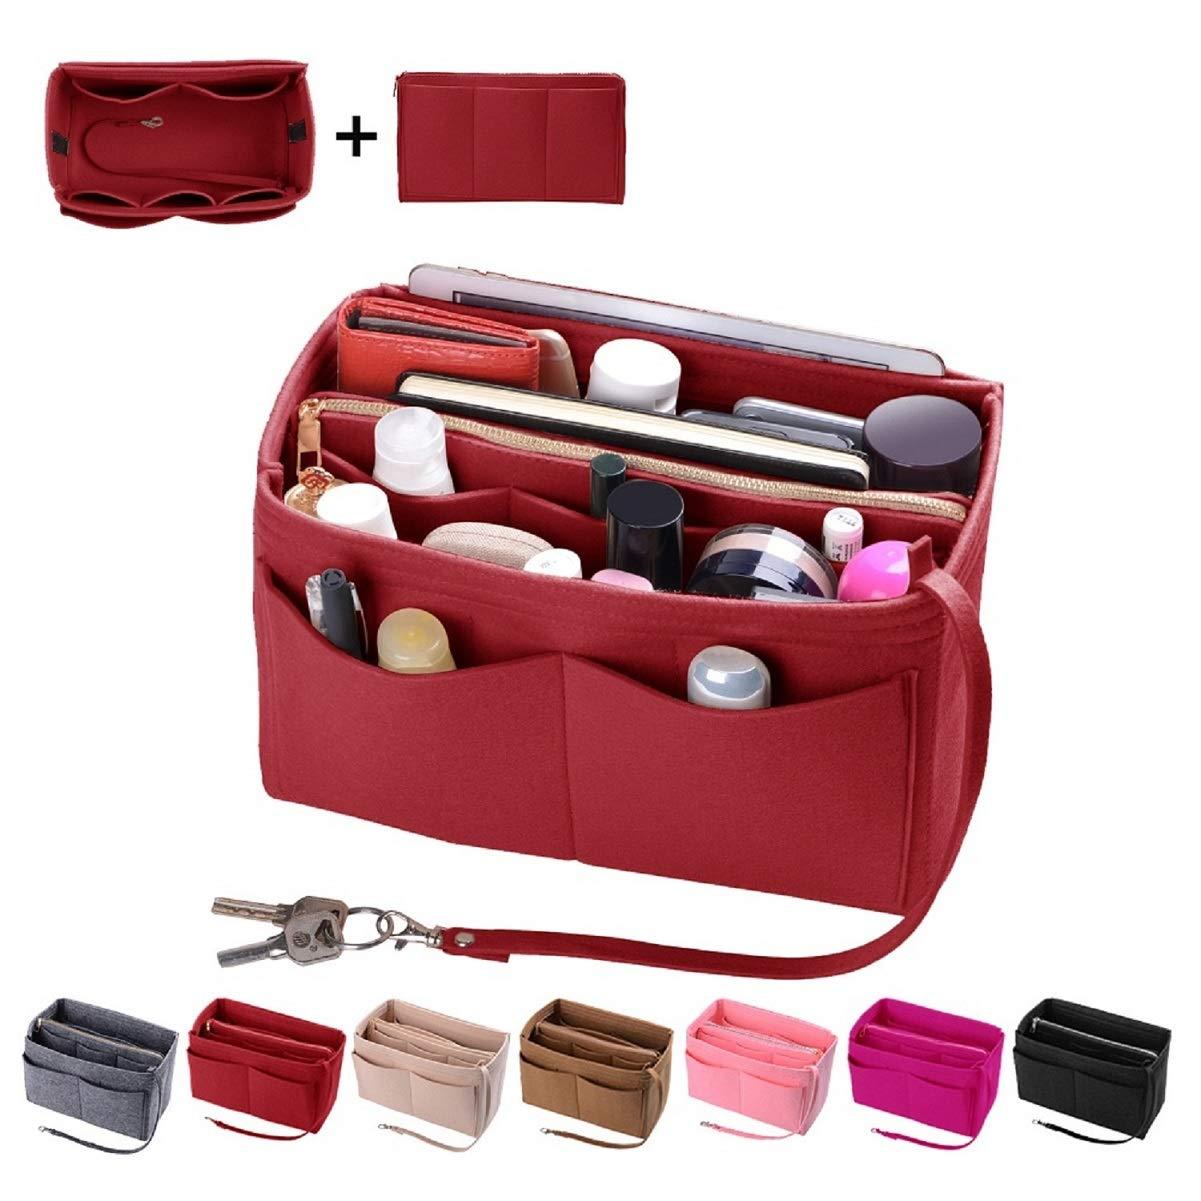 Purse Organizer Insert, Felt Bag organizer with zipper, Handbag & Tote Shaper, Fit LV Speedy, Neverfull, Longchamp, Tote (Slender Large, Red)